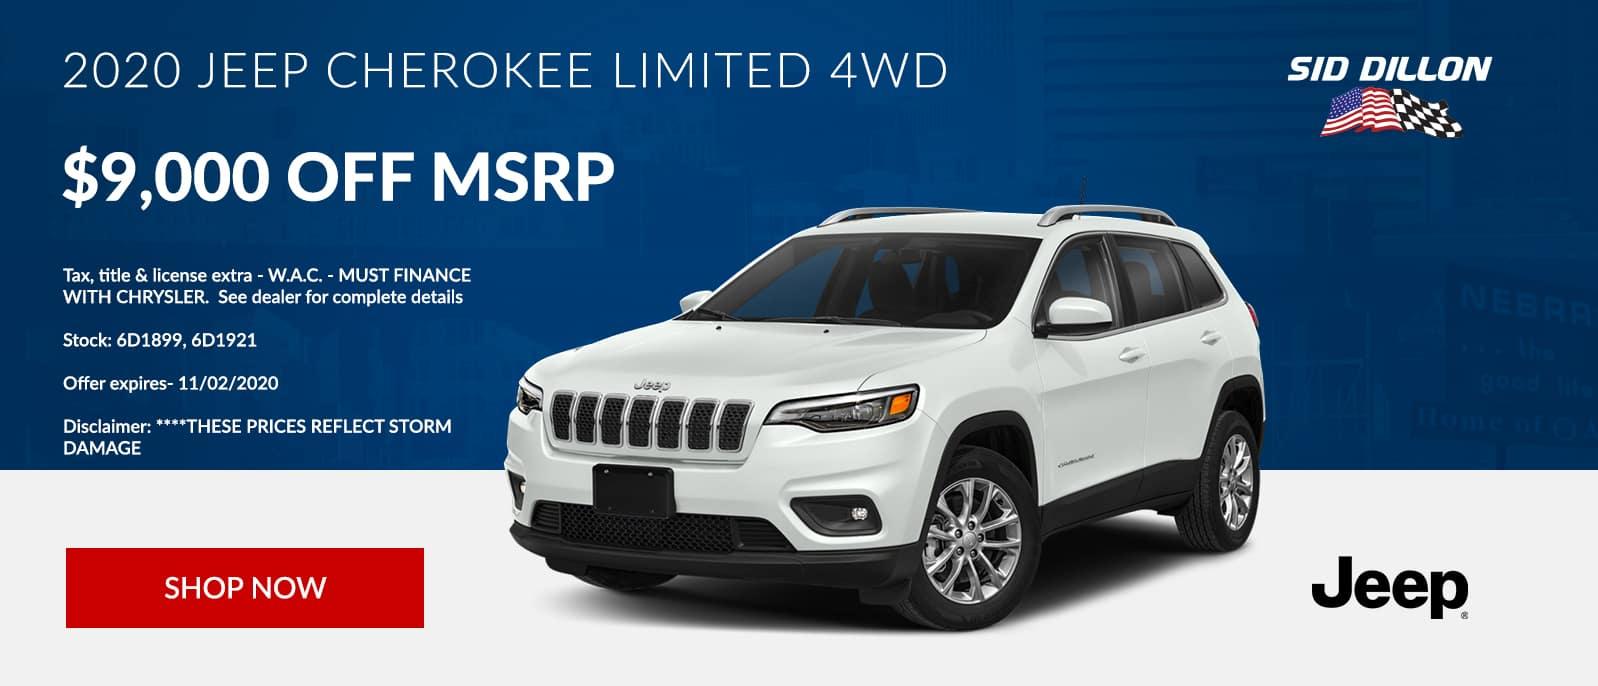 200 Jeep Cherokee Limited